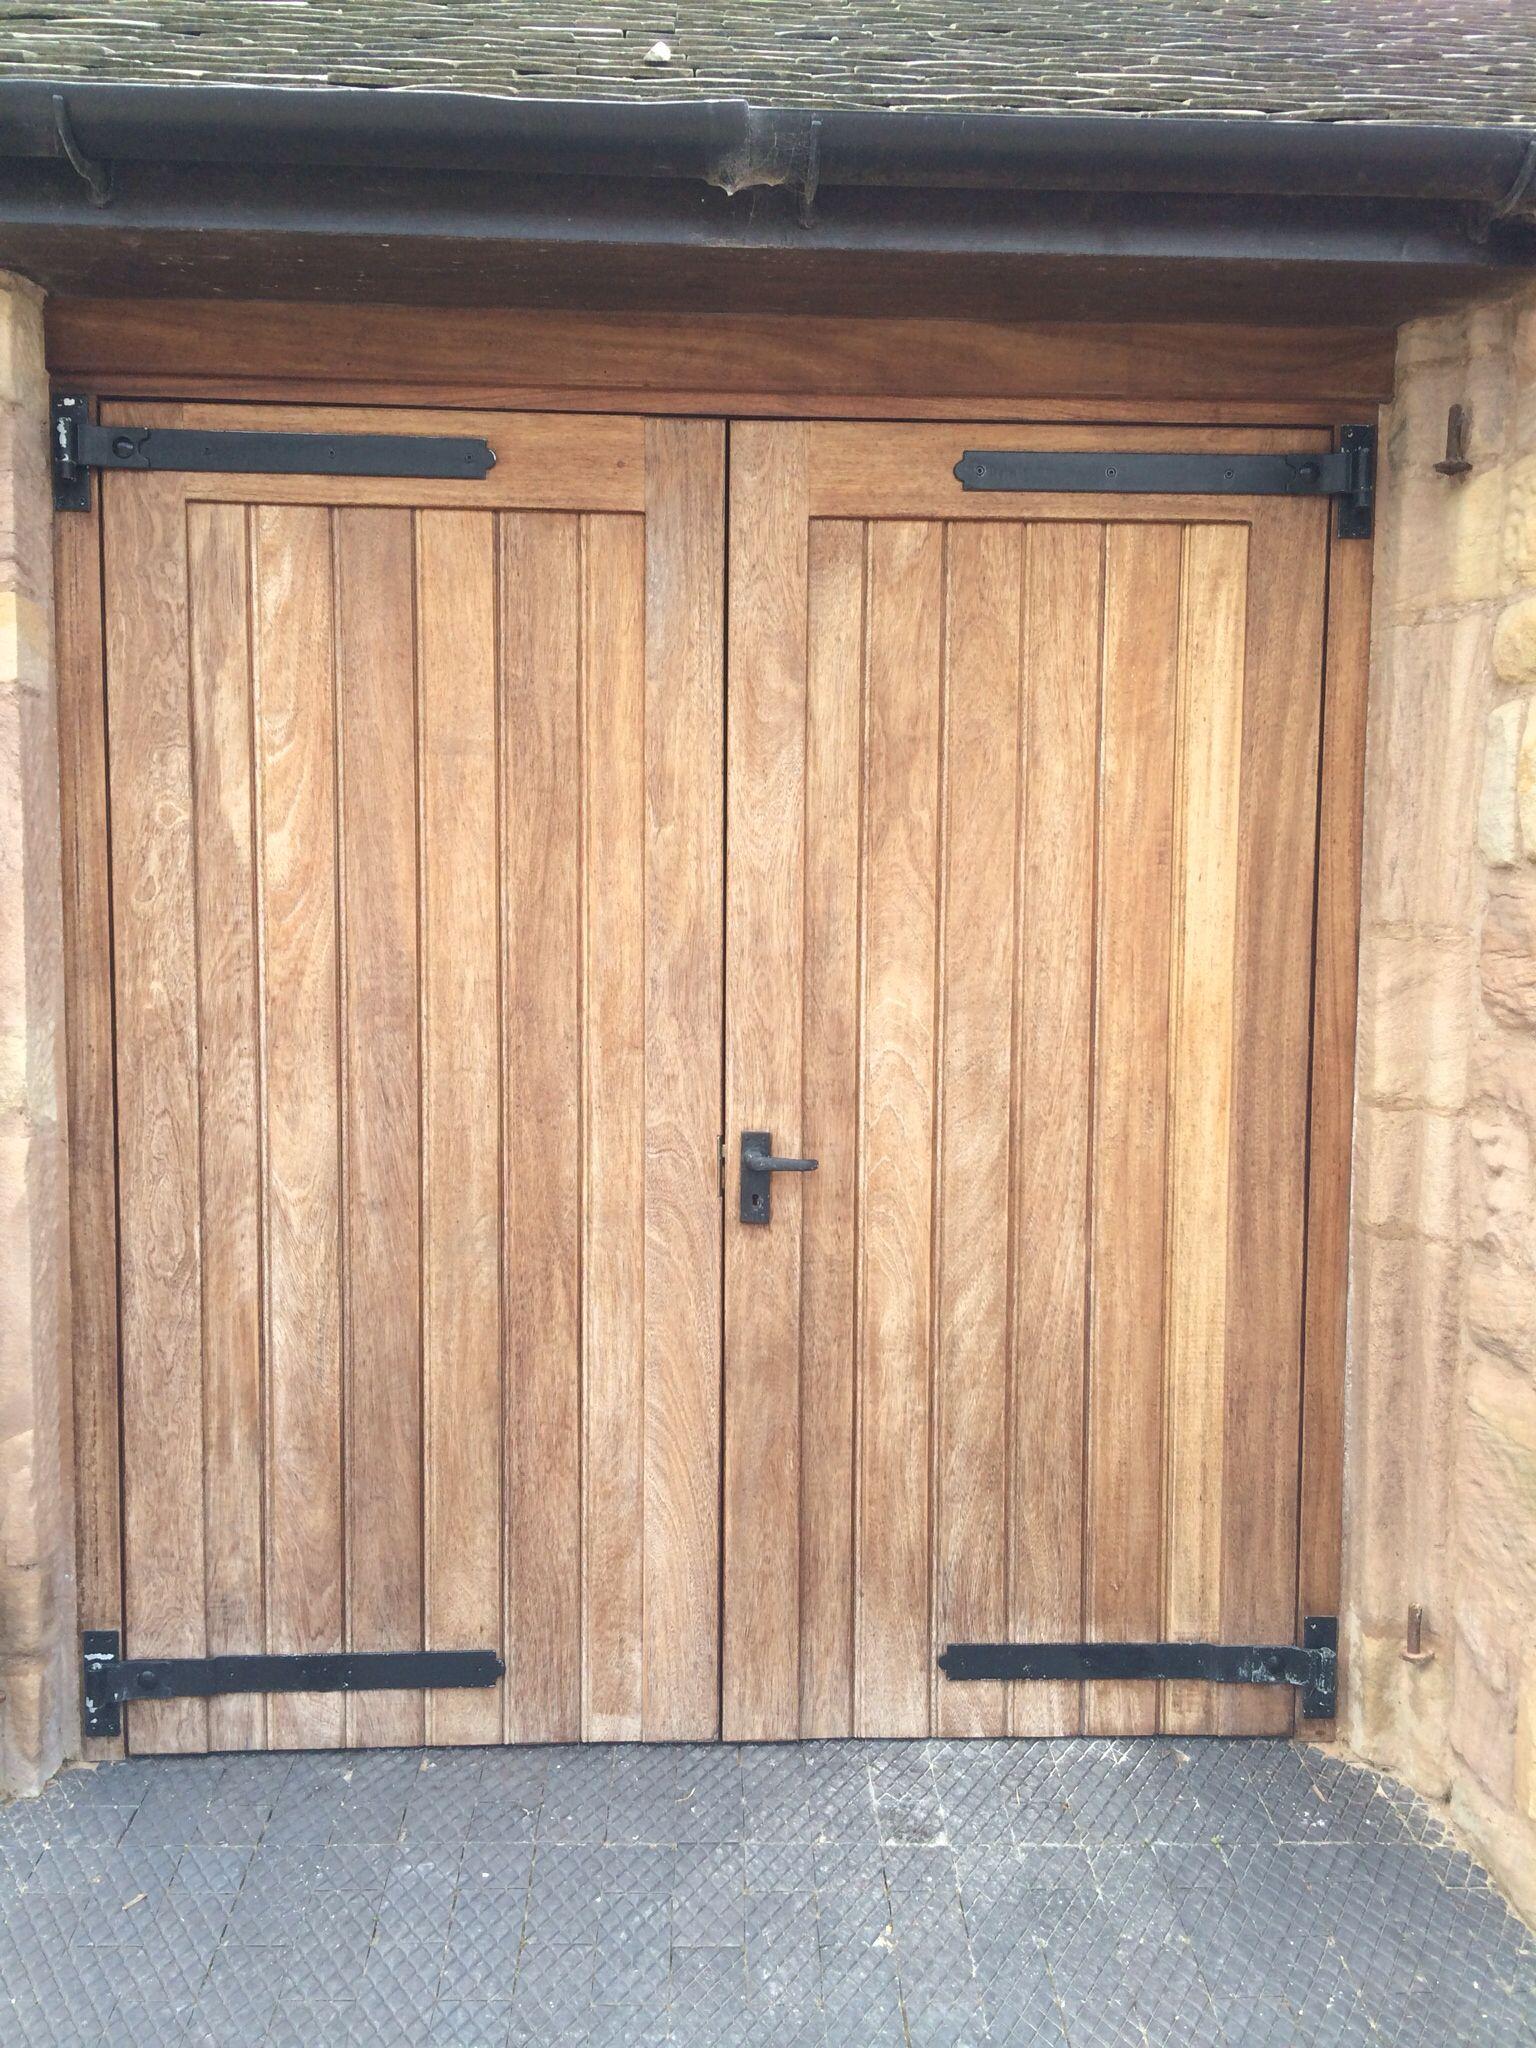 Iroko Garage Doors After A Few Years Of Weathering Looks Beautiful